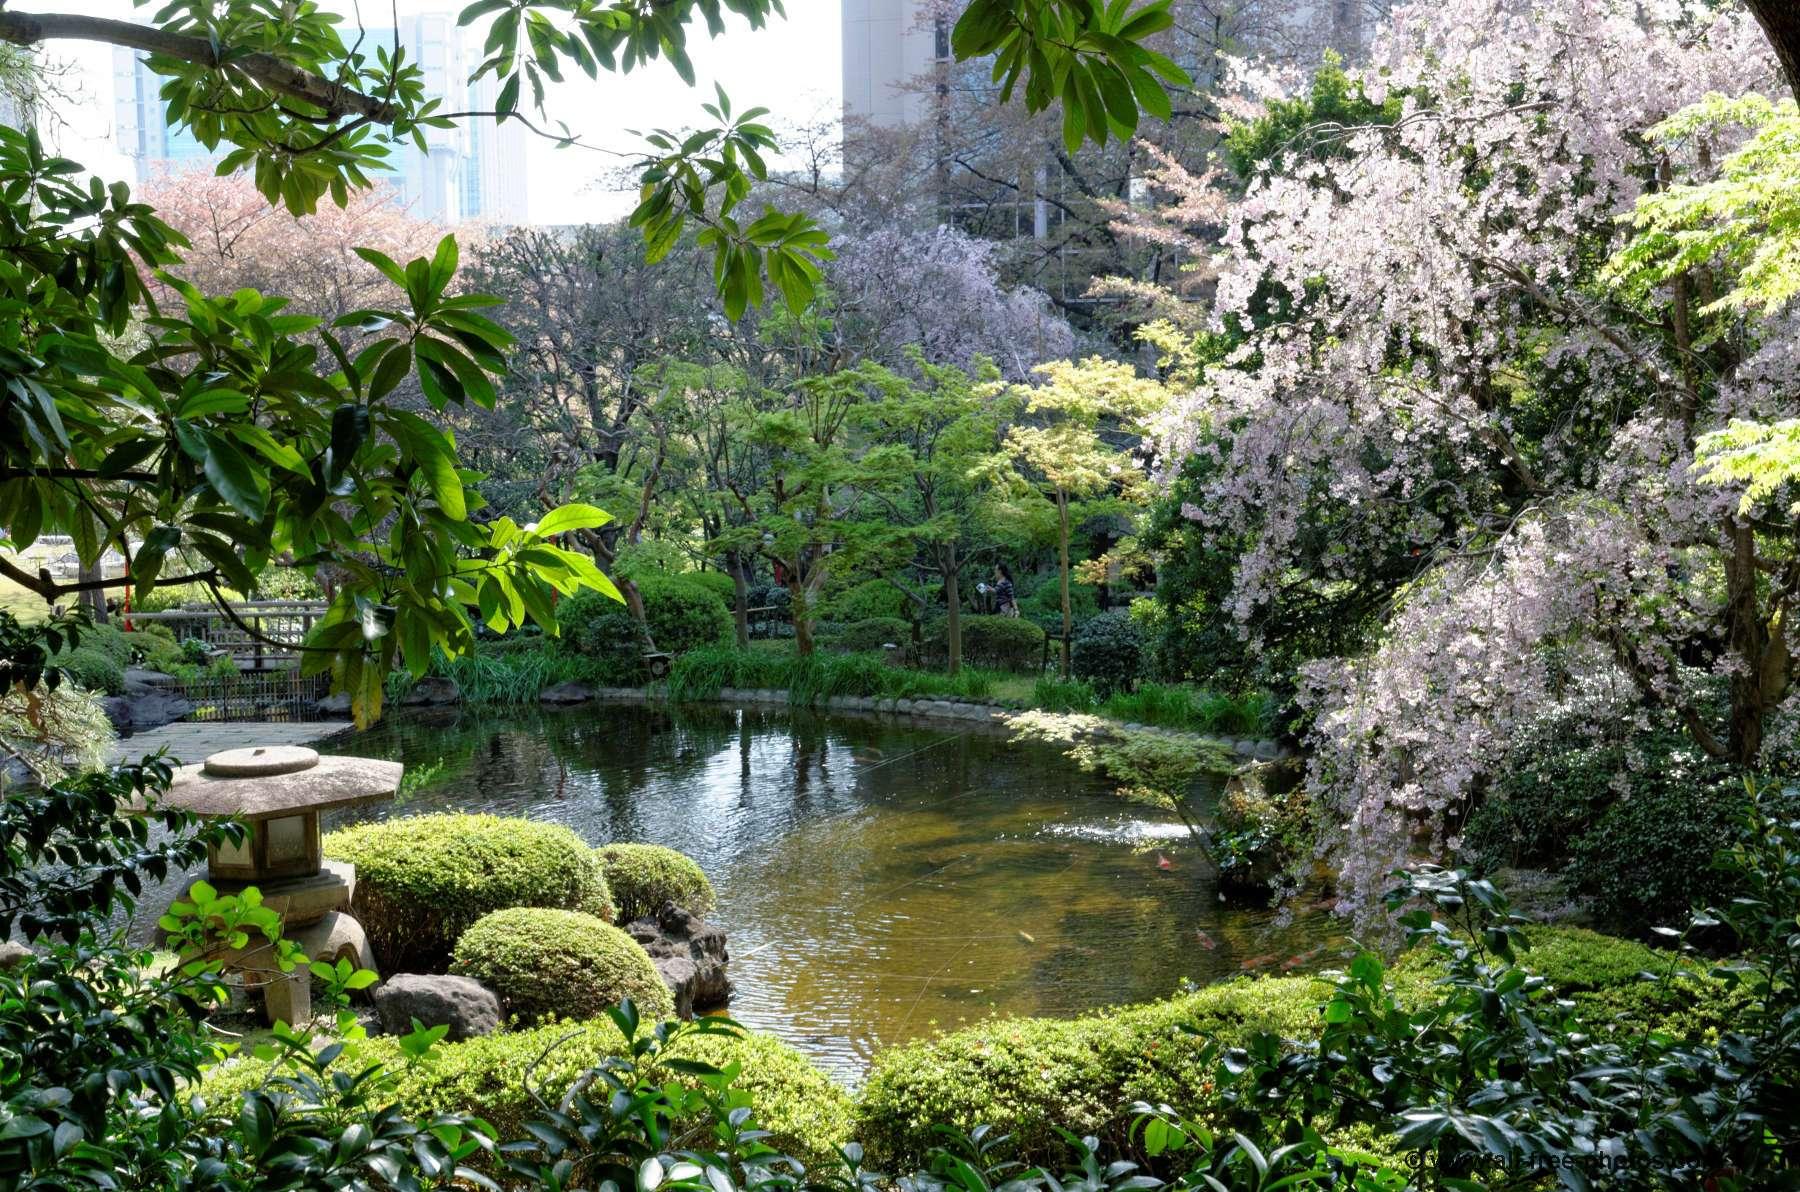 Vista de un jardín